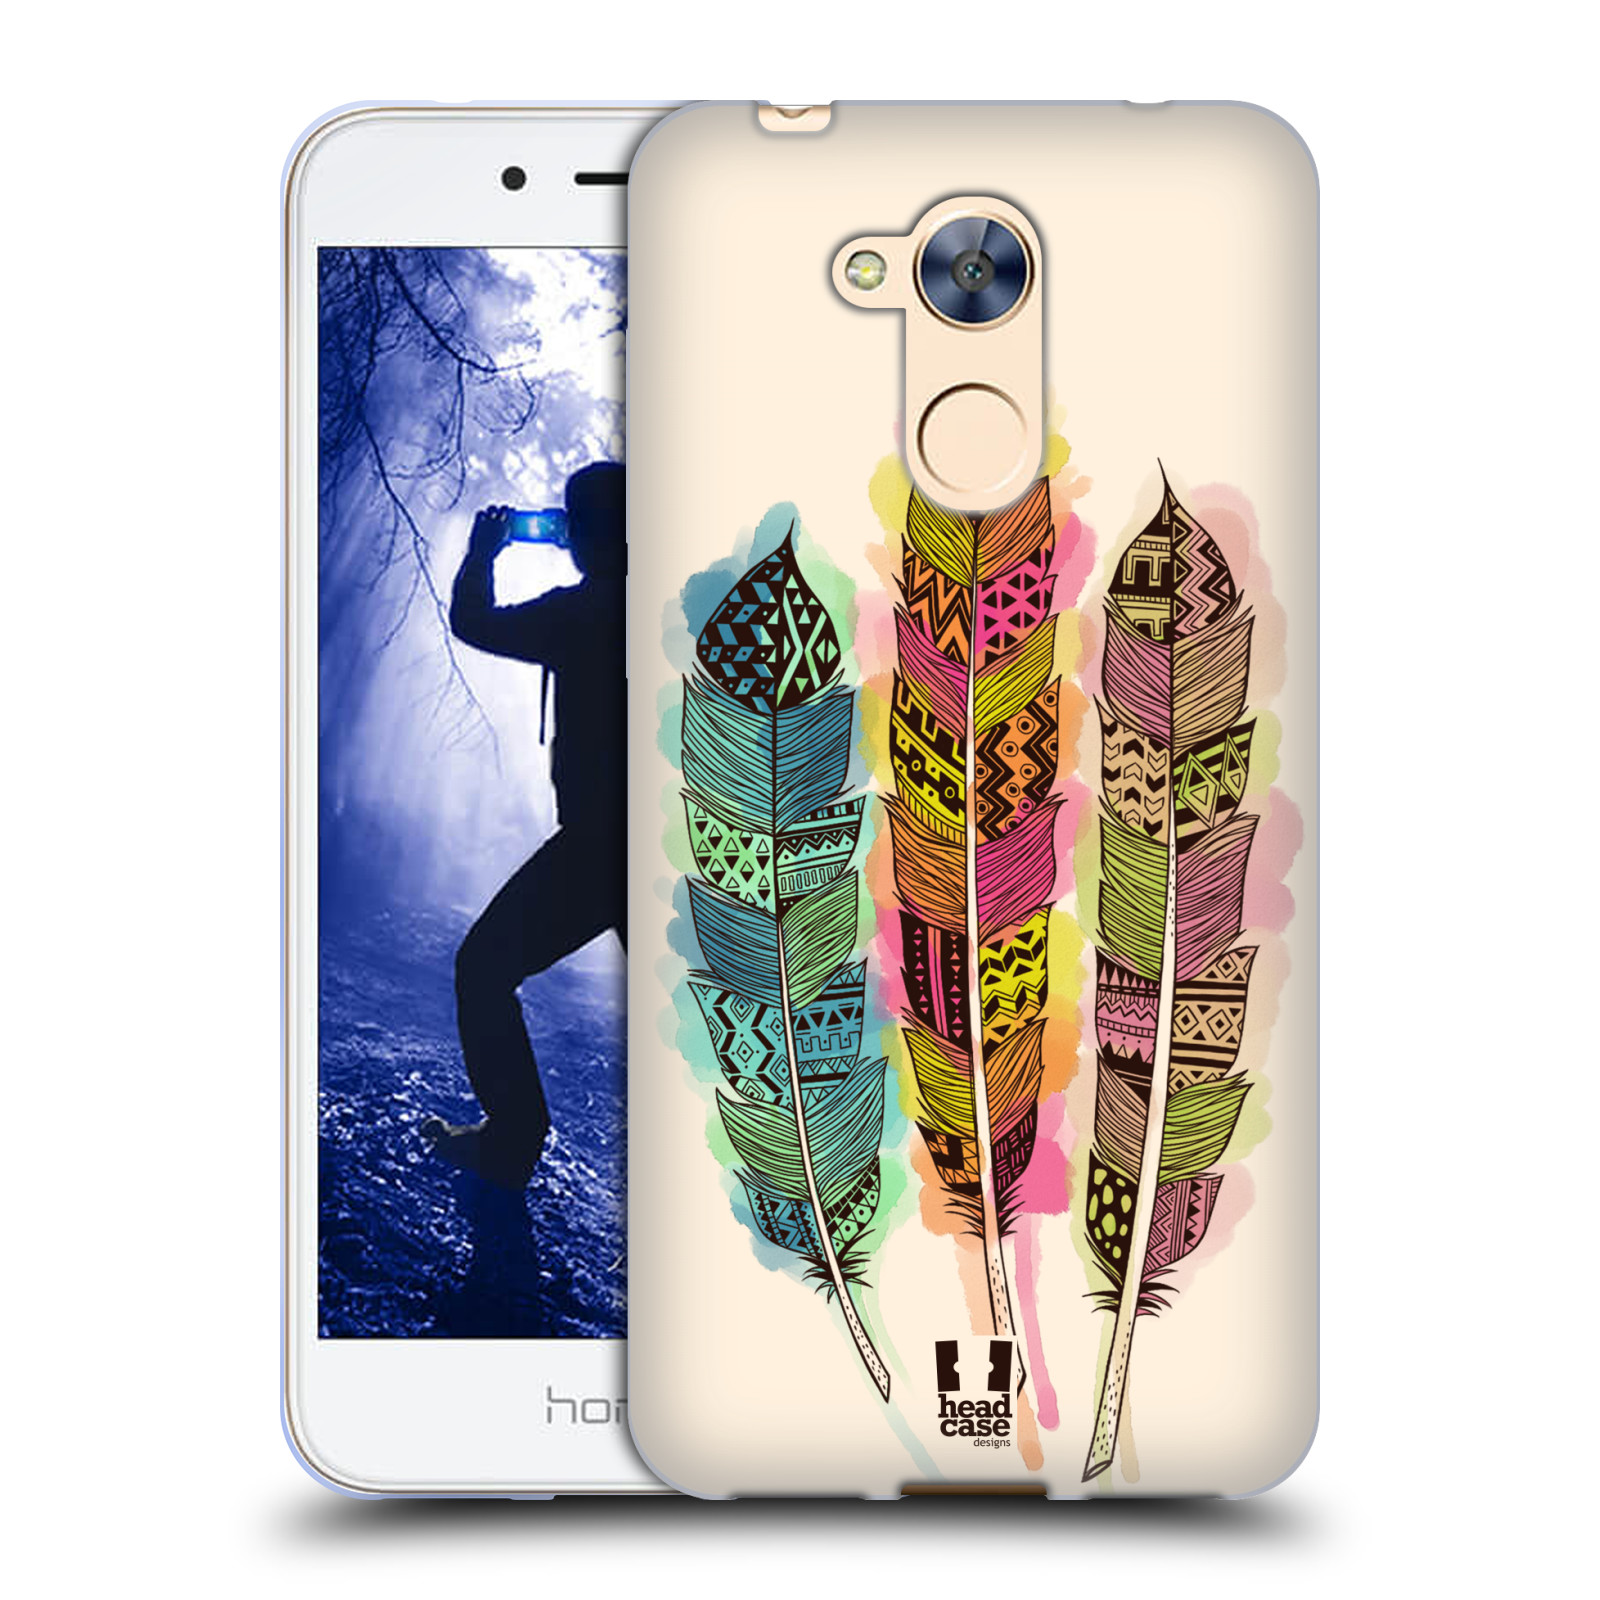 Silikonové pouzdro na mobil Honor 6A - Head Case - AZTEC PÍRKA SPLASH